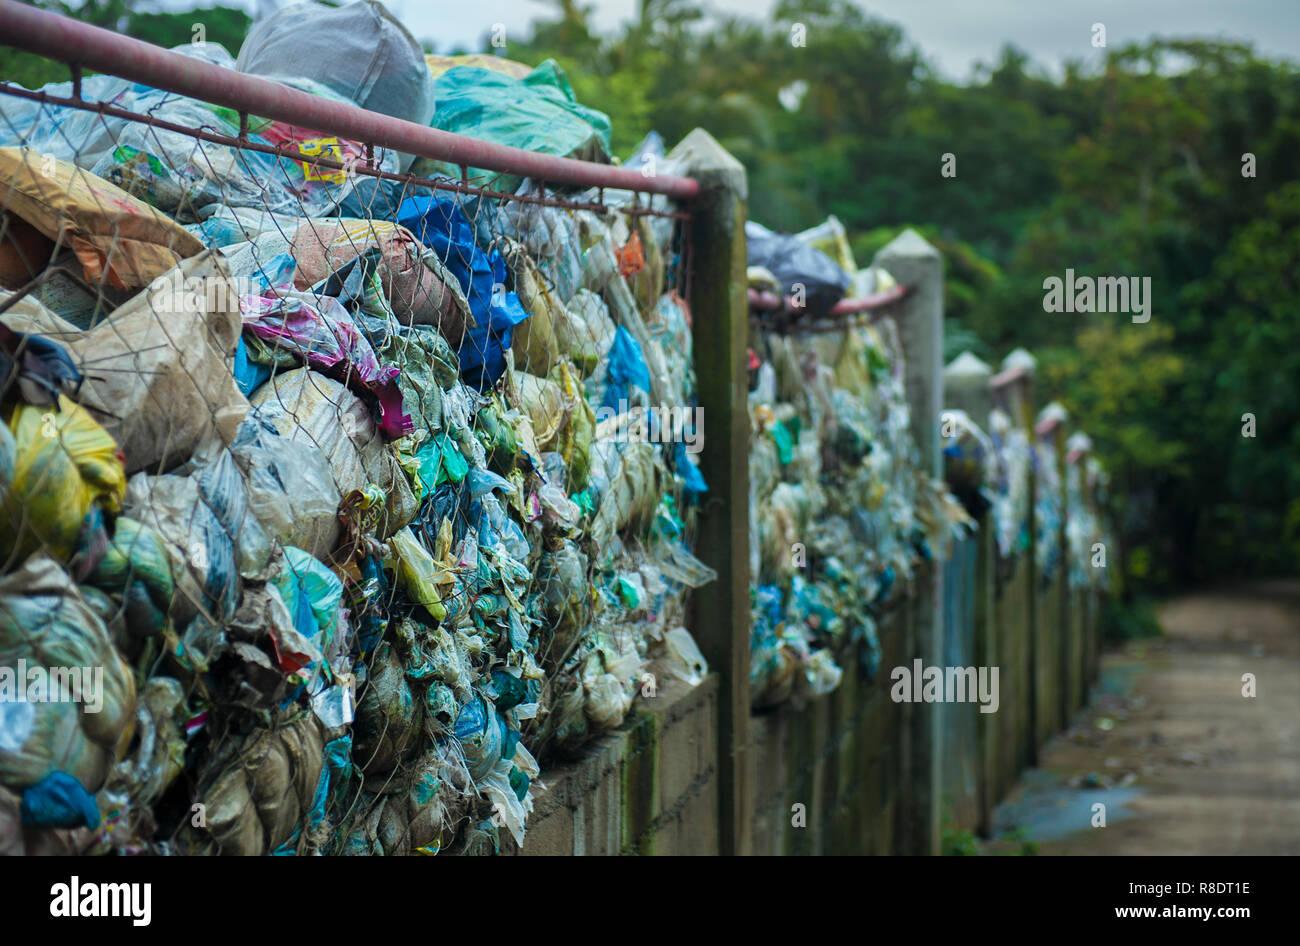 Landfill on Boracay Island, Philippines - Stock Image